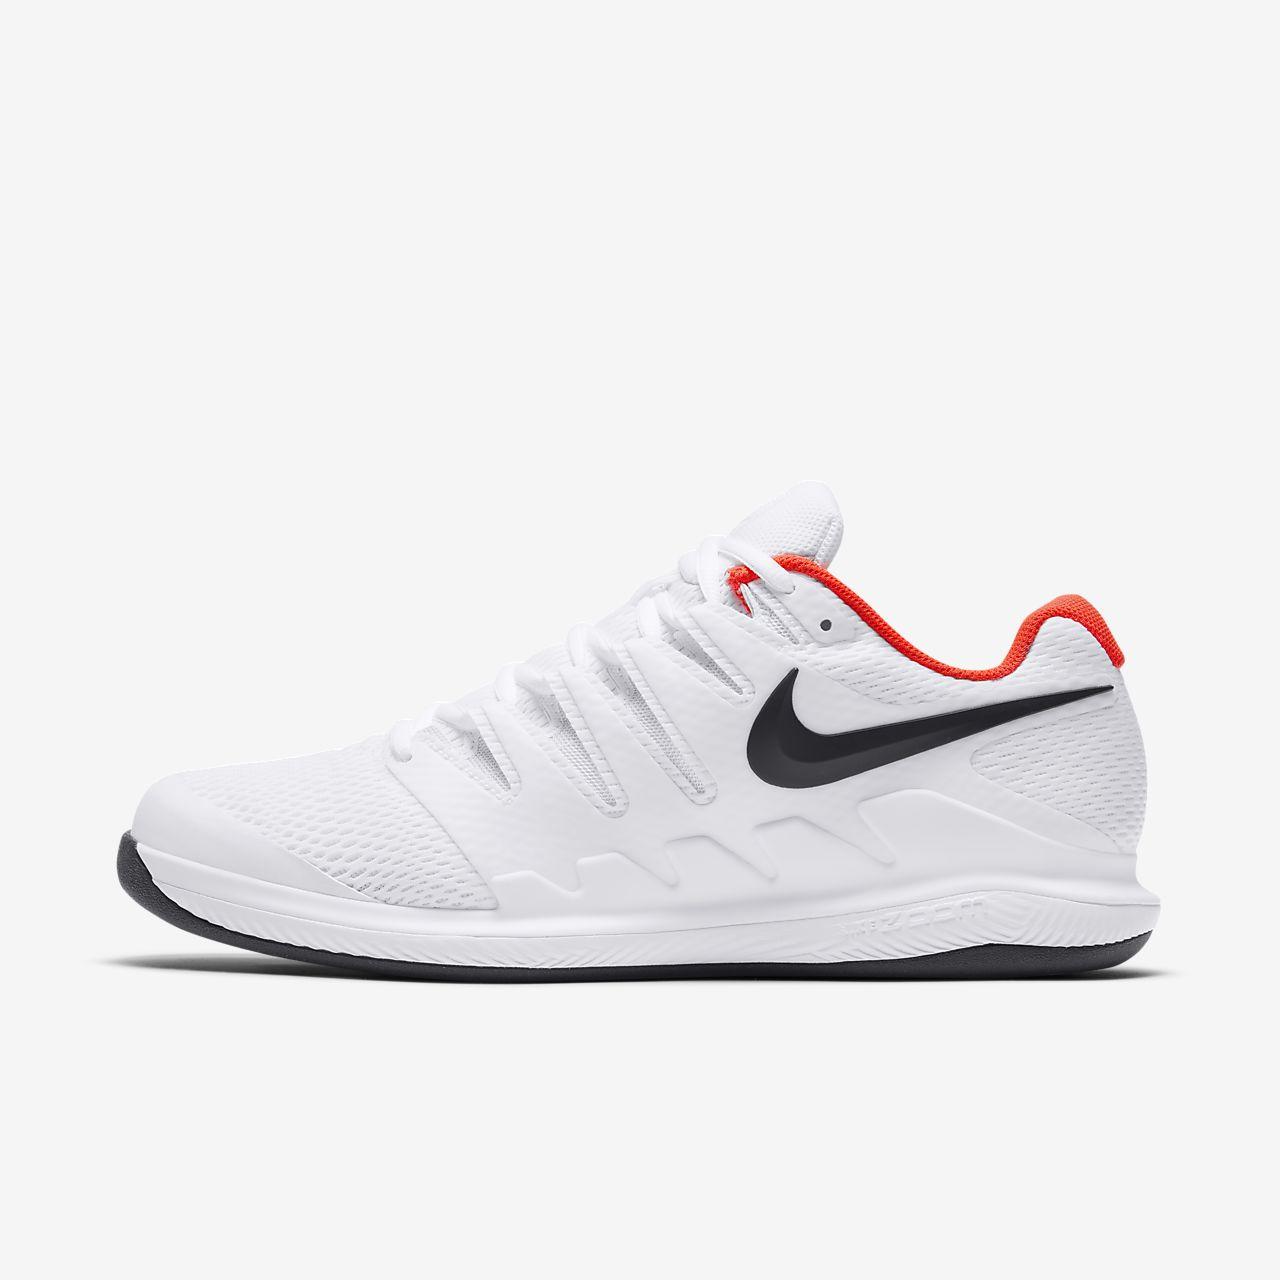 86c37134 Мужские теннисные кроссовки Nike Air Zoom Vapor X Carpet. Nike.com RU